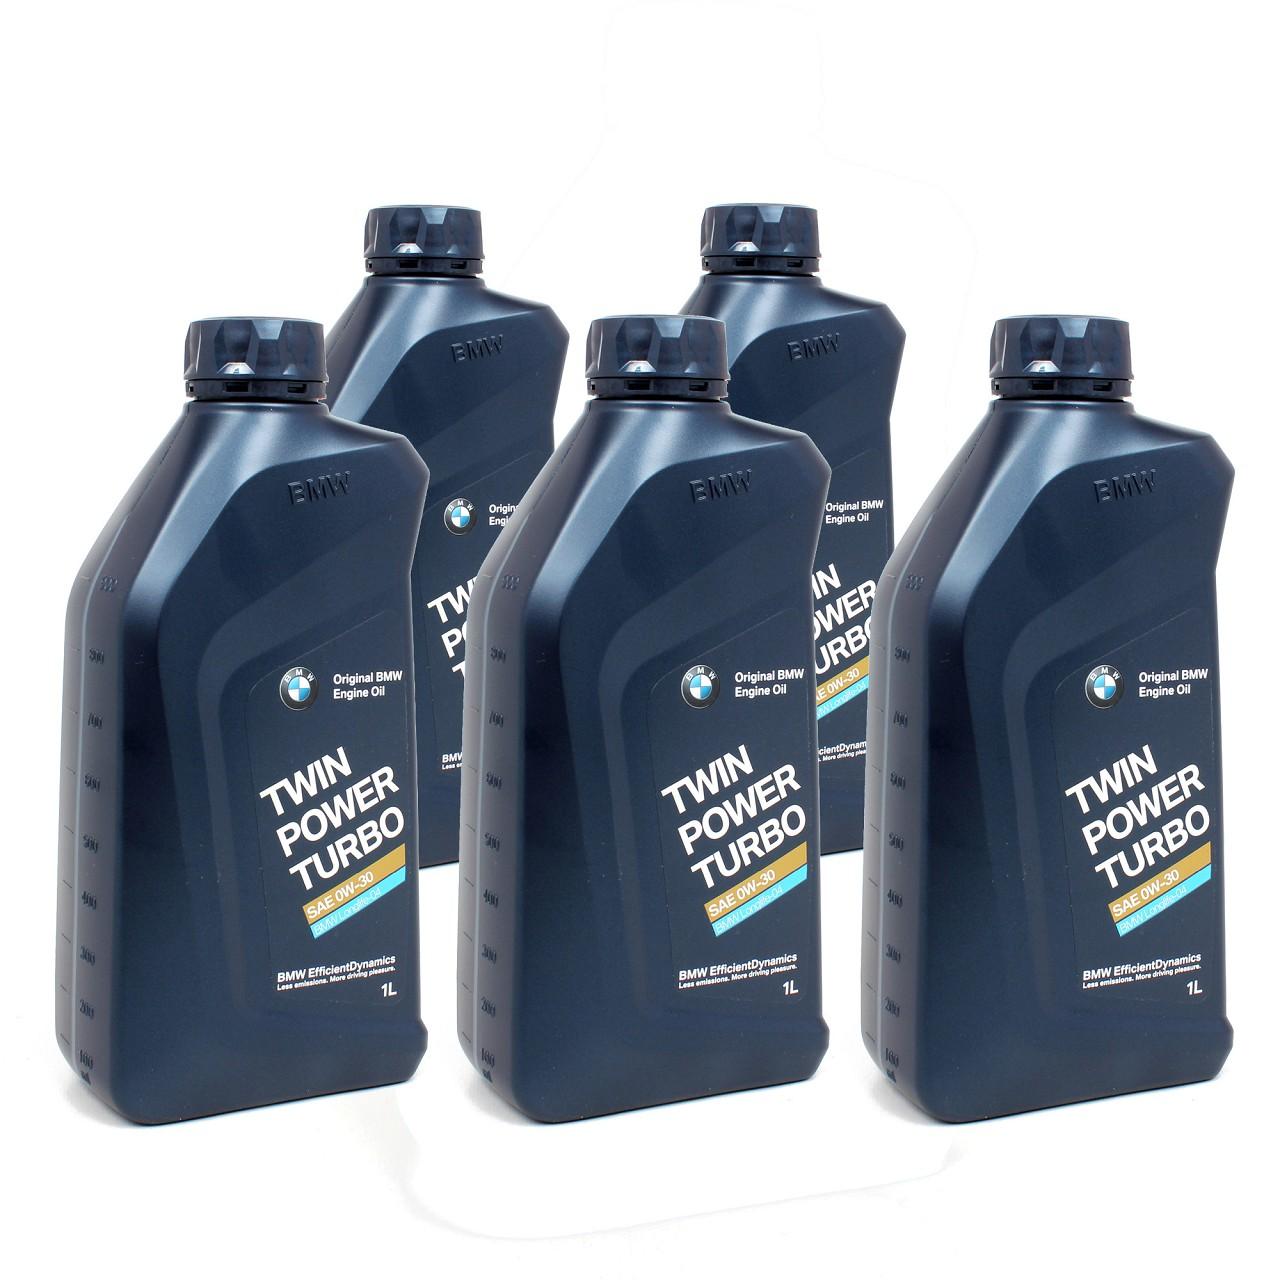 ORIGINAL BMW Motoröl Öl 0W30 Twin Power Turbo LongLife-04 5 Liter 83212465854